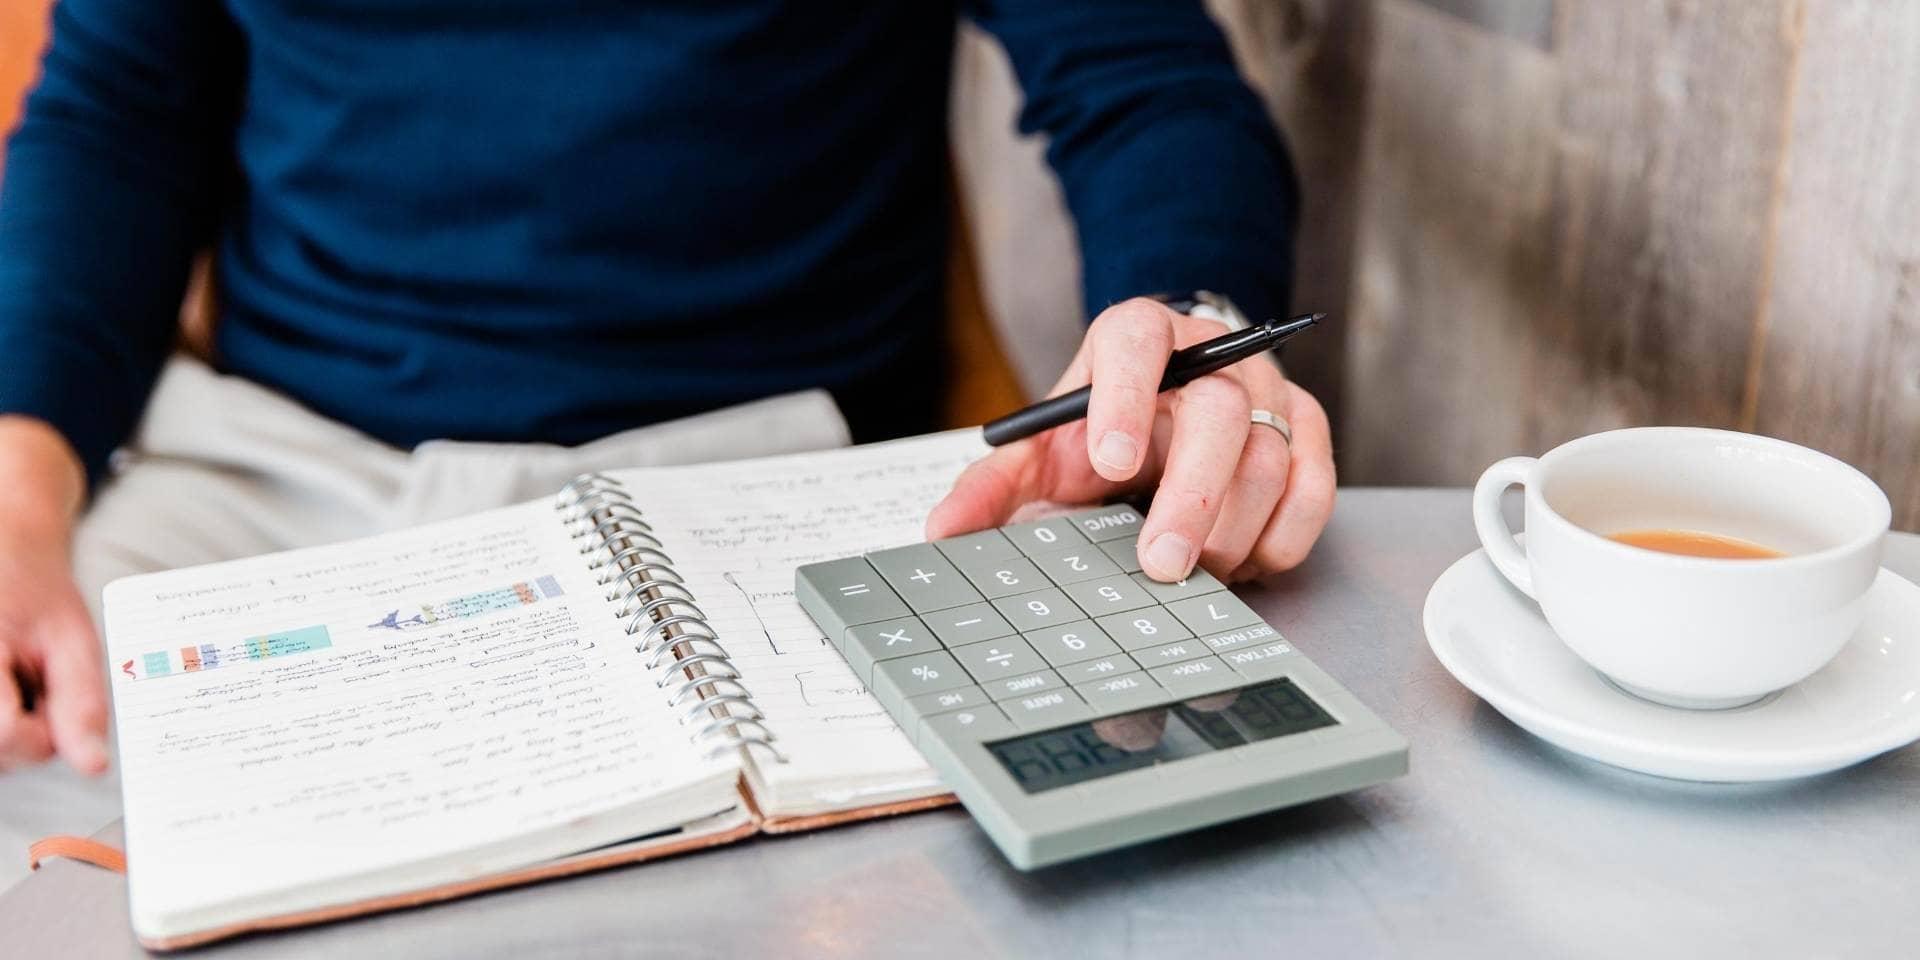 Pension Specialist Simon garber explains Money purchase annual allowance